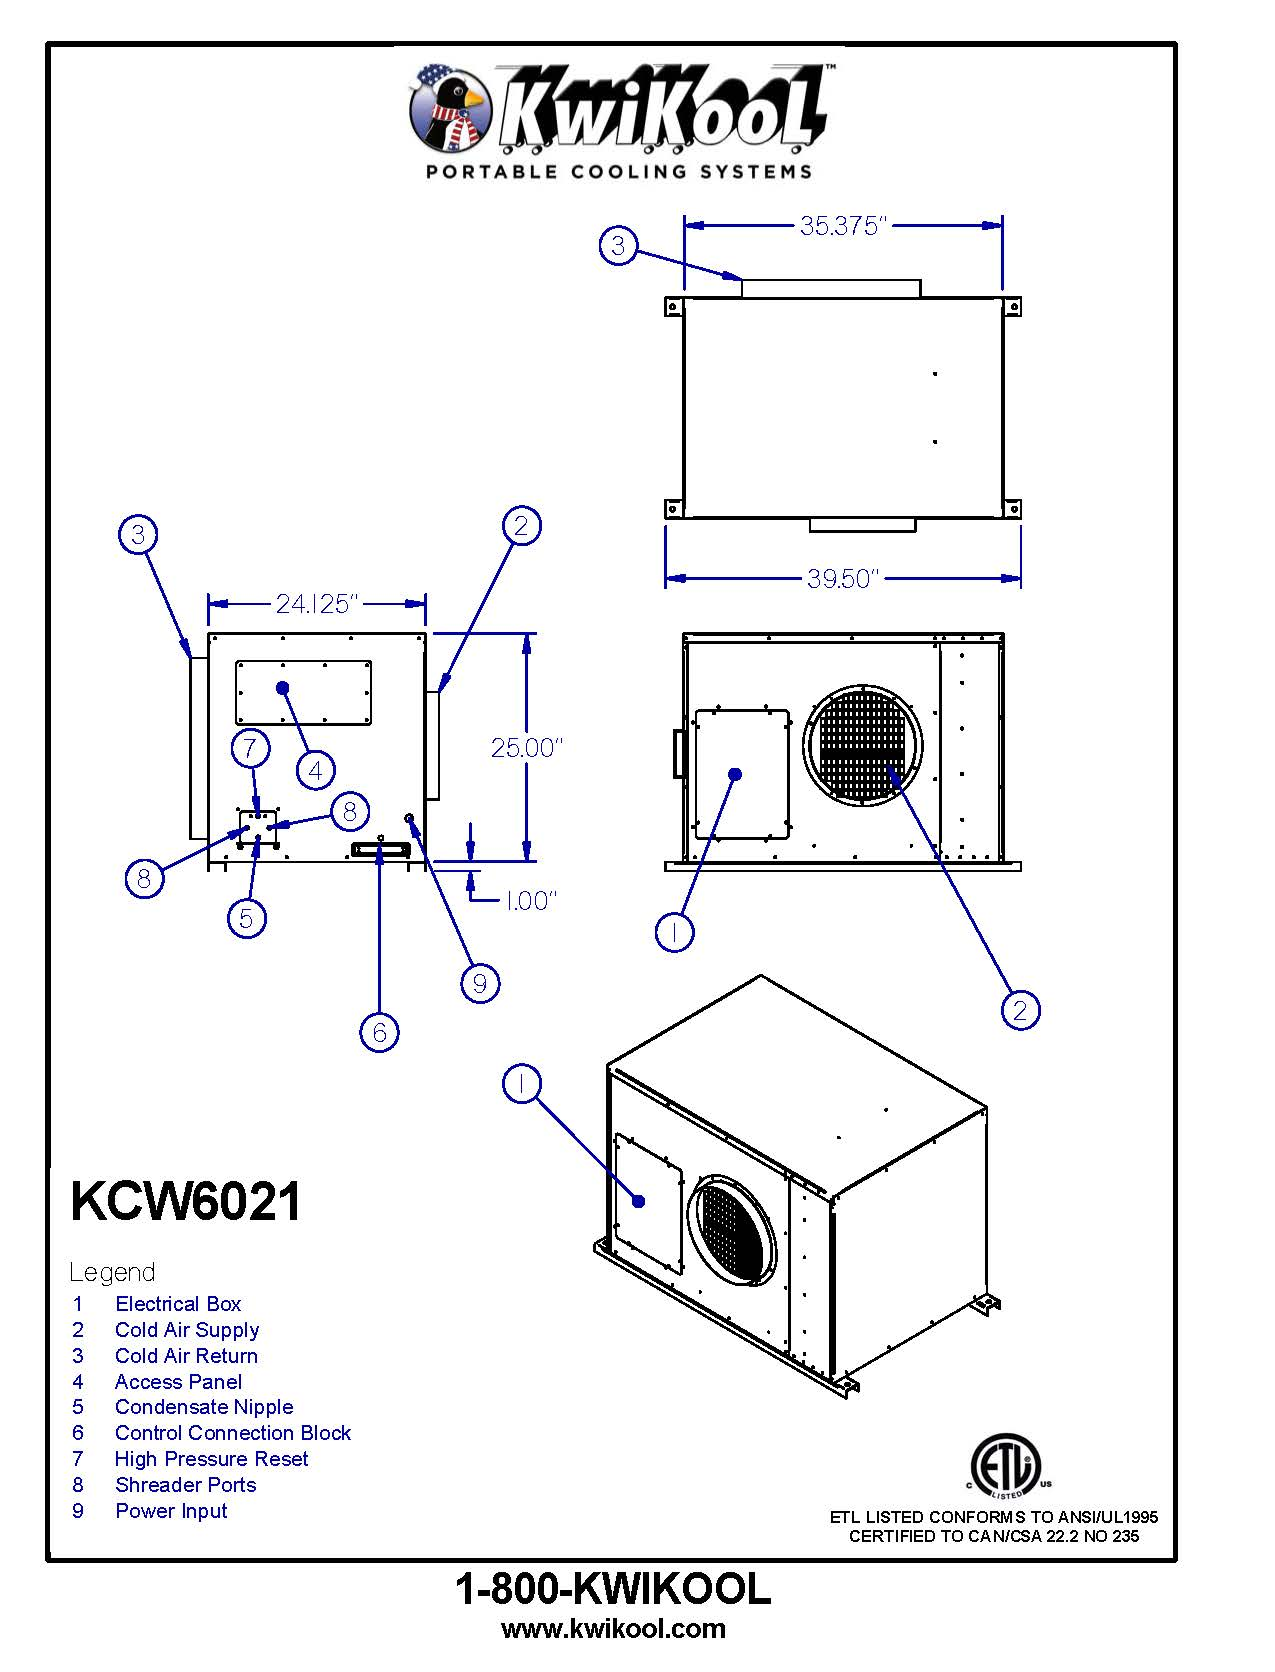 kcw6021